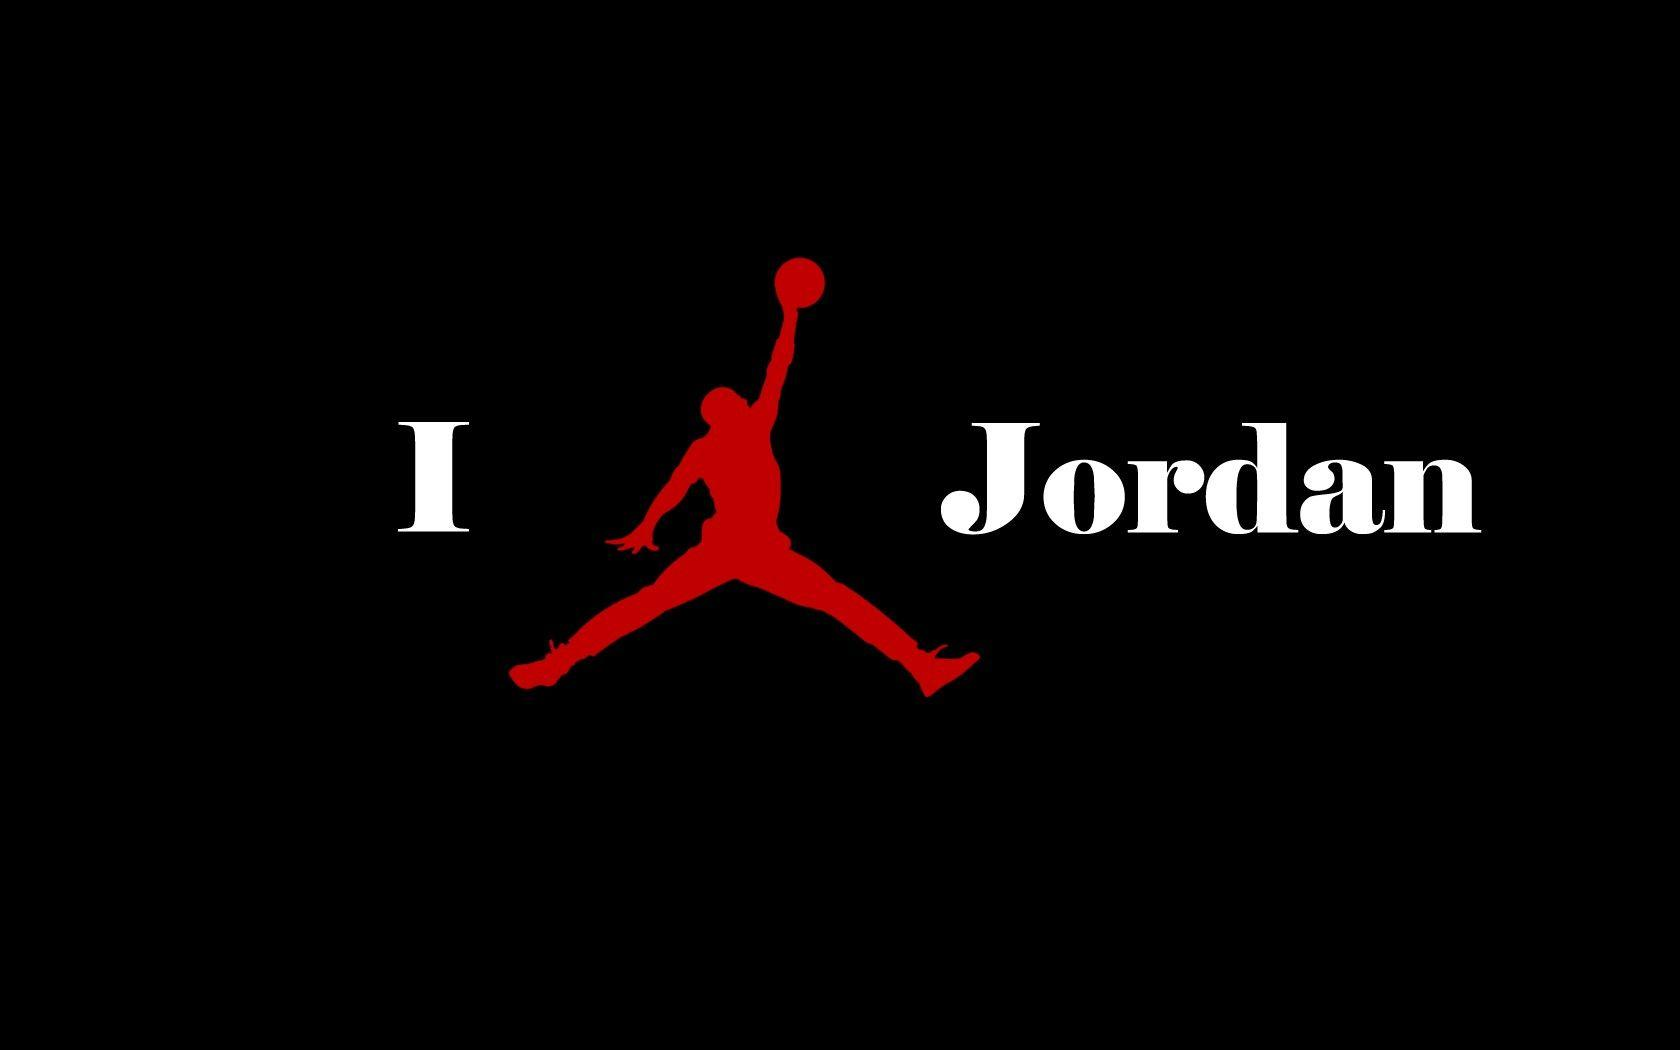 new styles 66345 f3d1b michael jordan logo wallpapers  2658